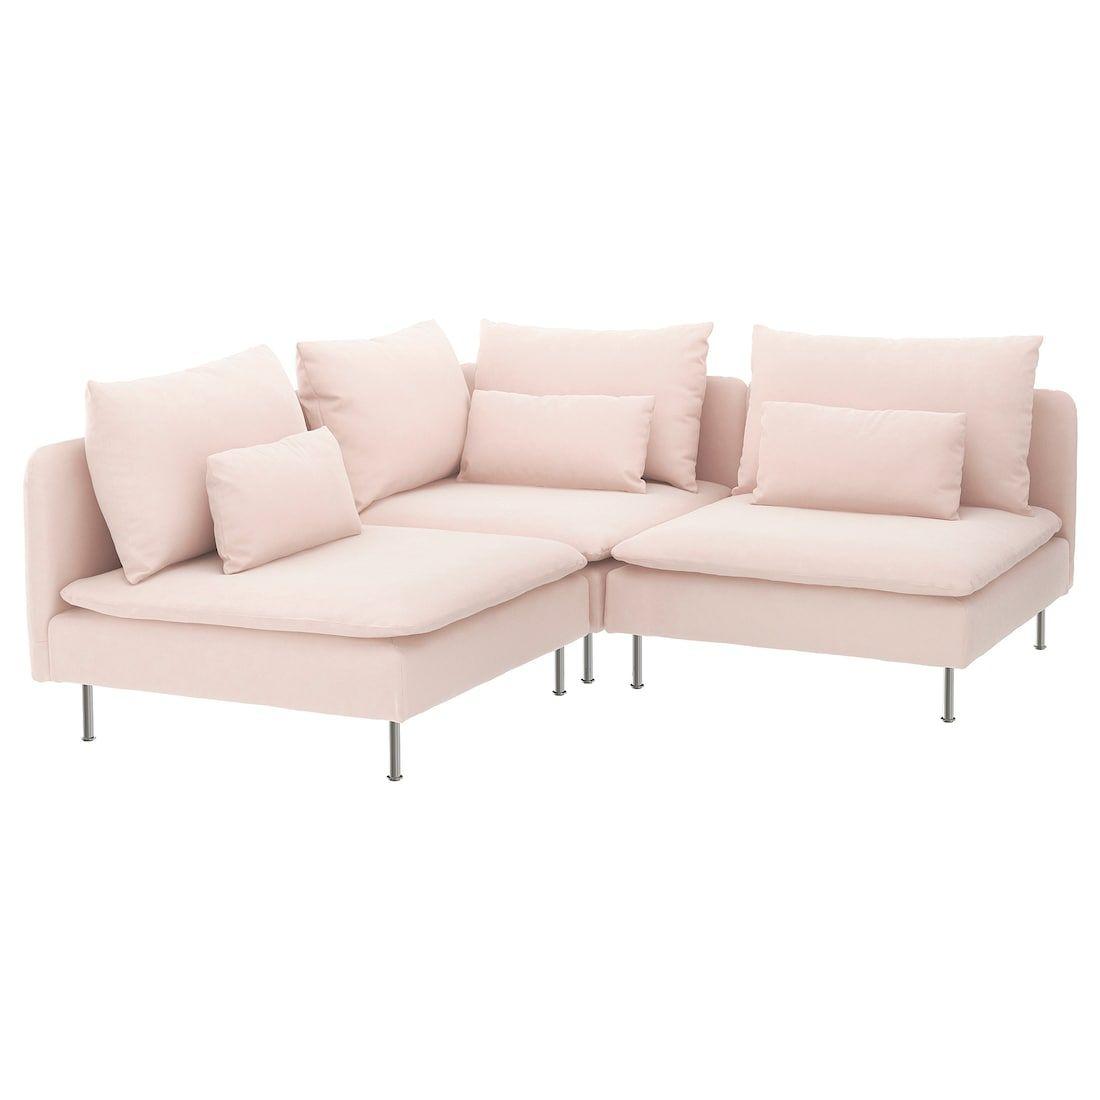 Soderhamn Sectional 3 Seat Corner Samsta Light Pink Sectional